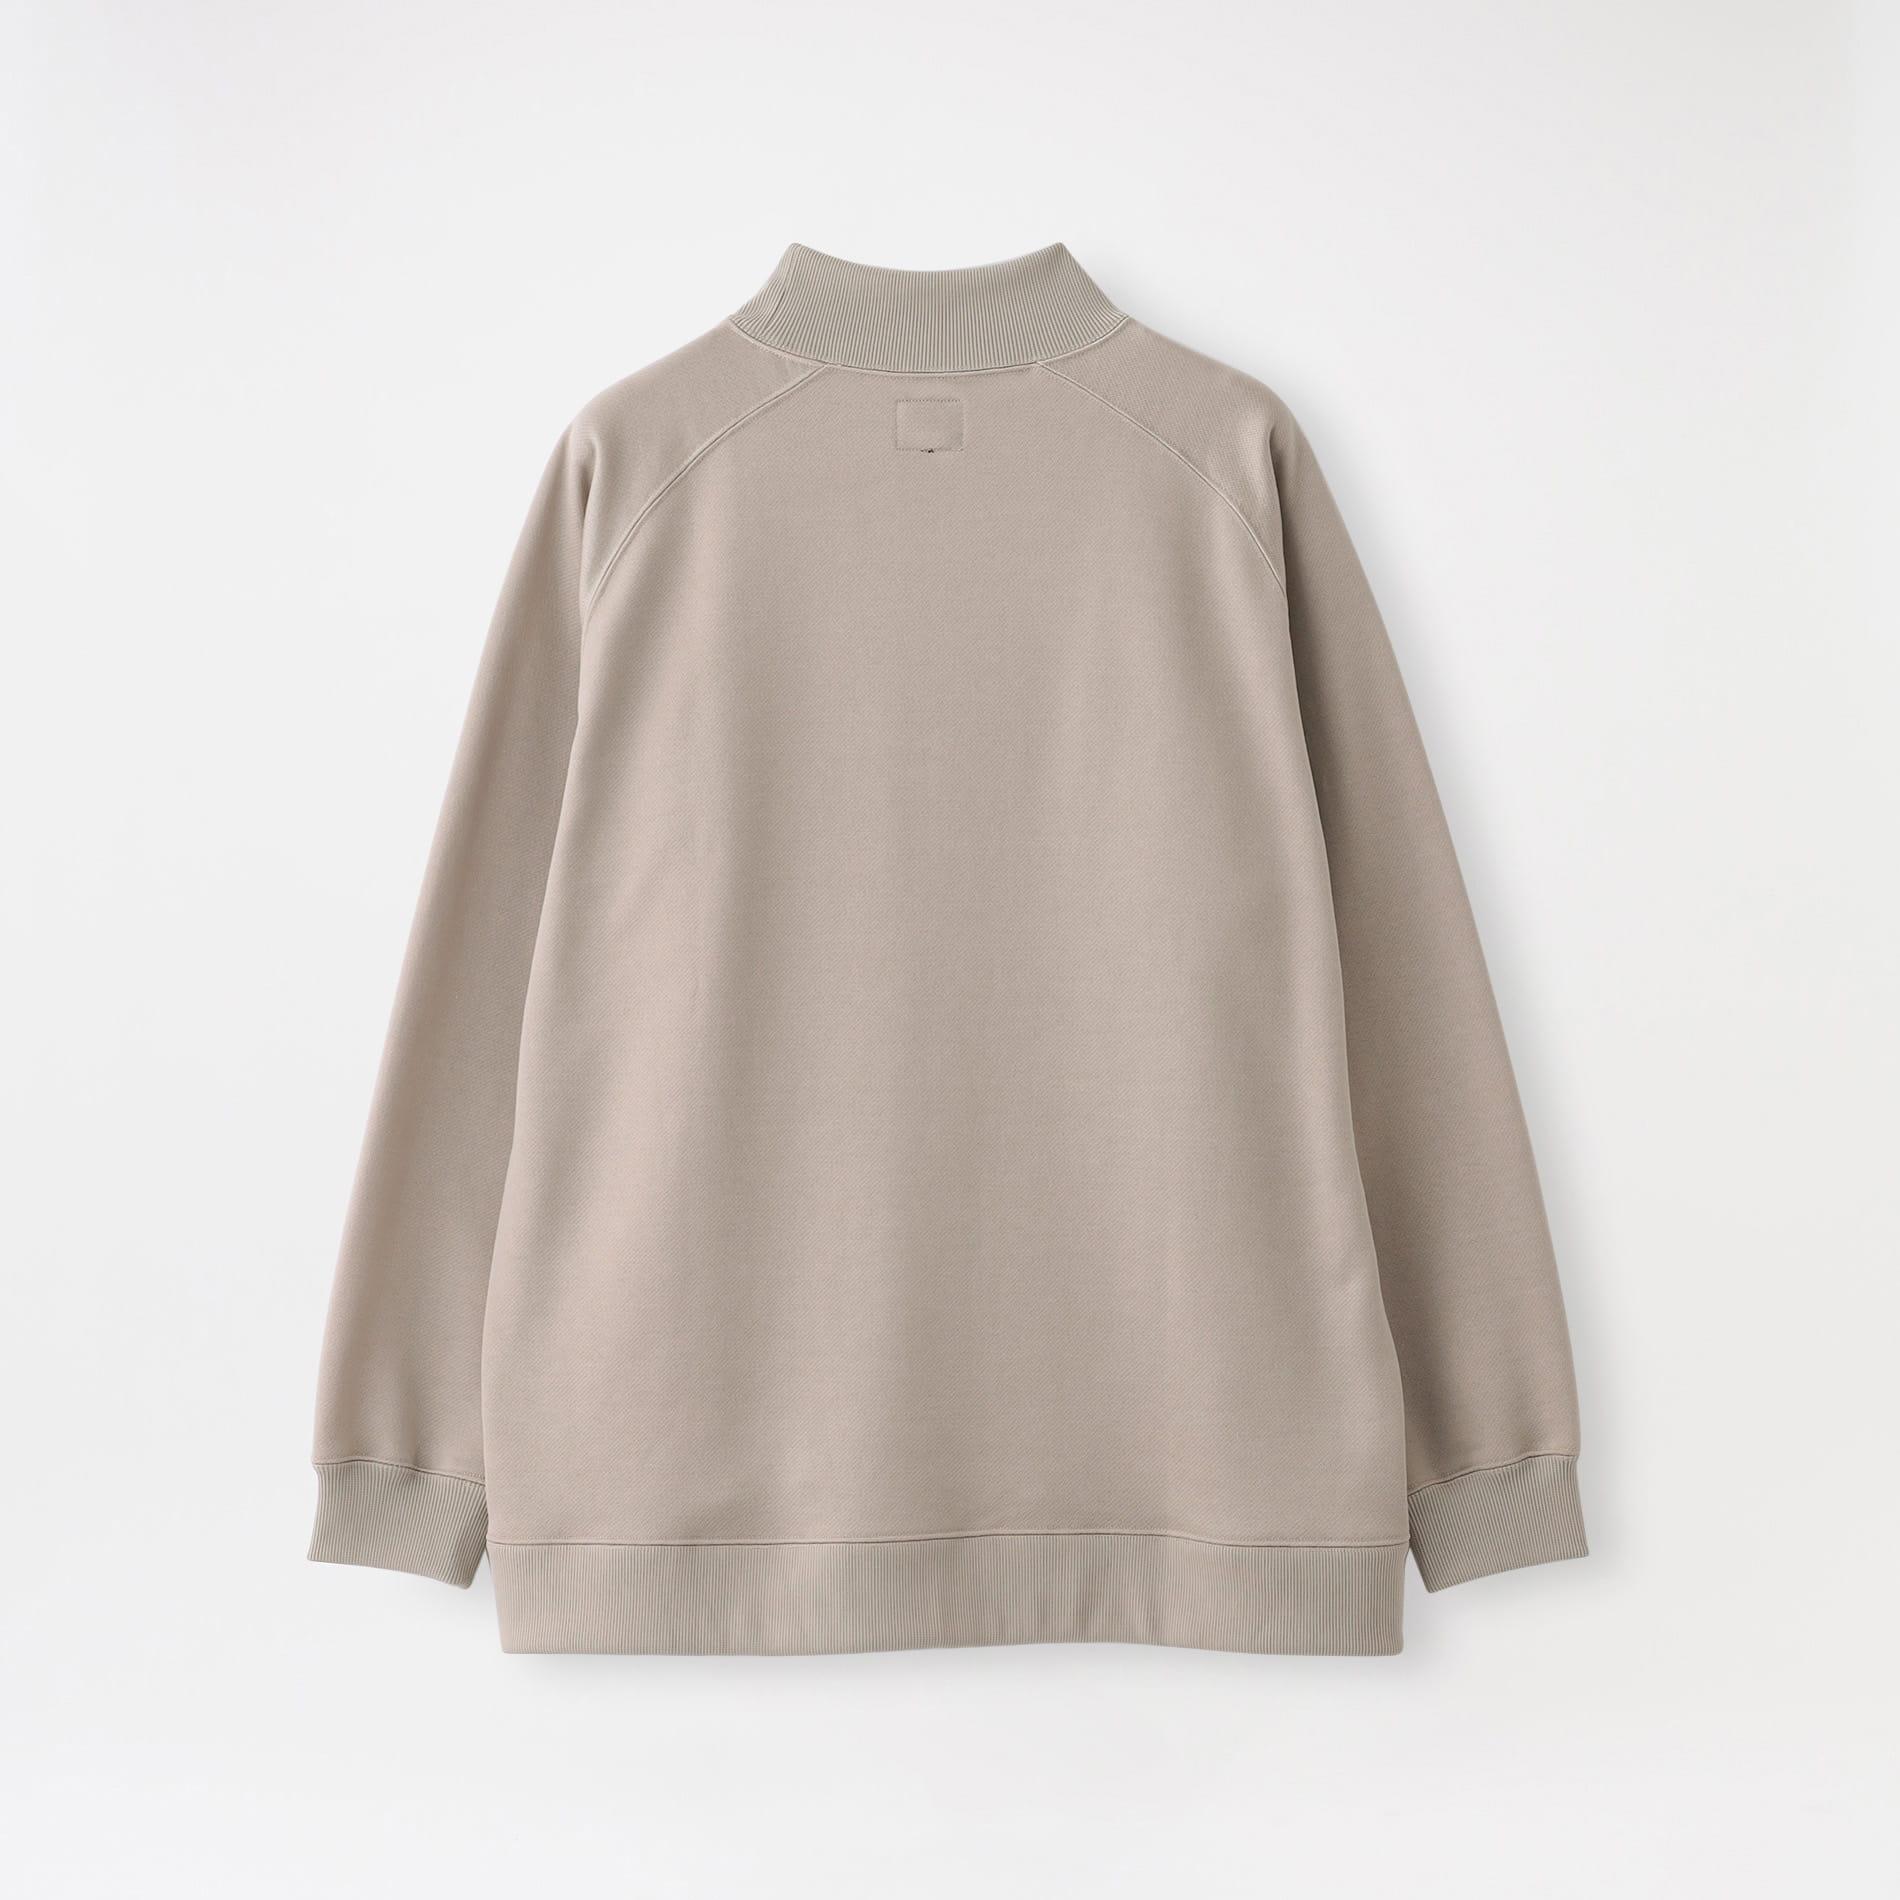 【Needles】MEN Tシャツ L/S Mock Neck Tee - C/Pe Bright Jersey JO232